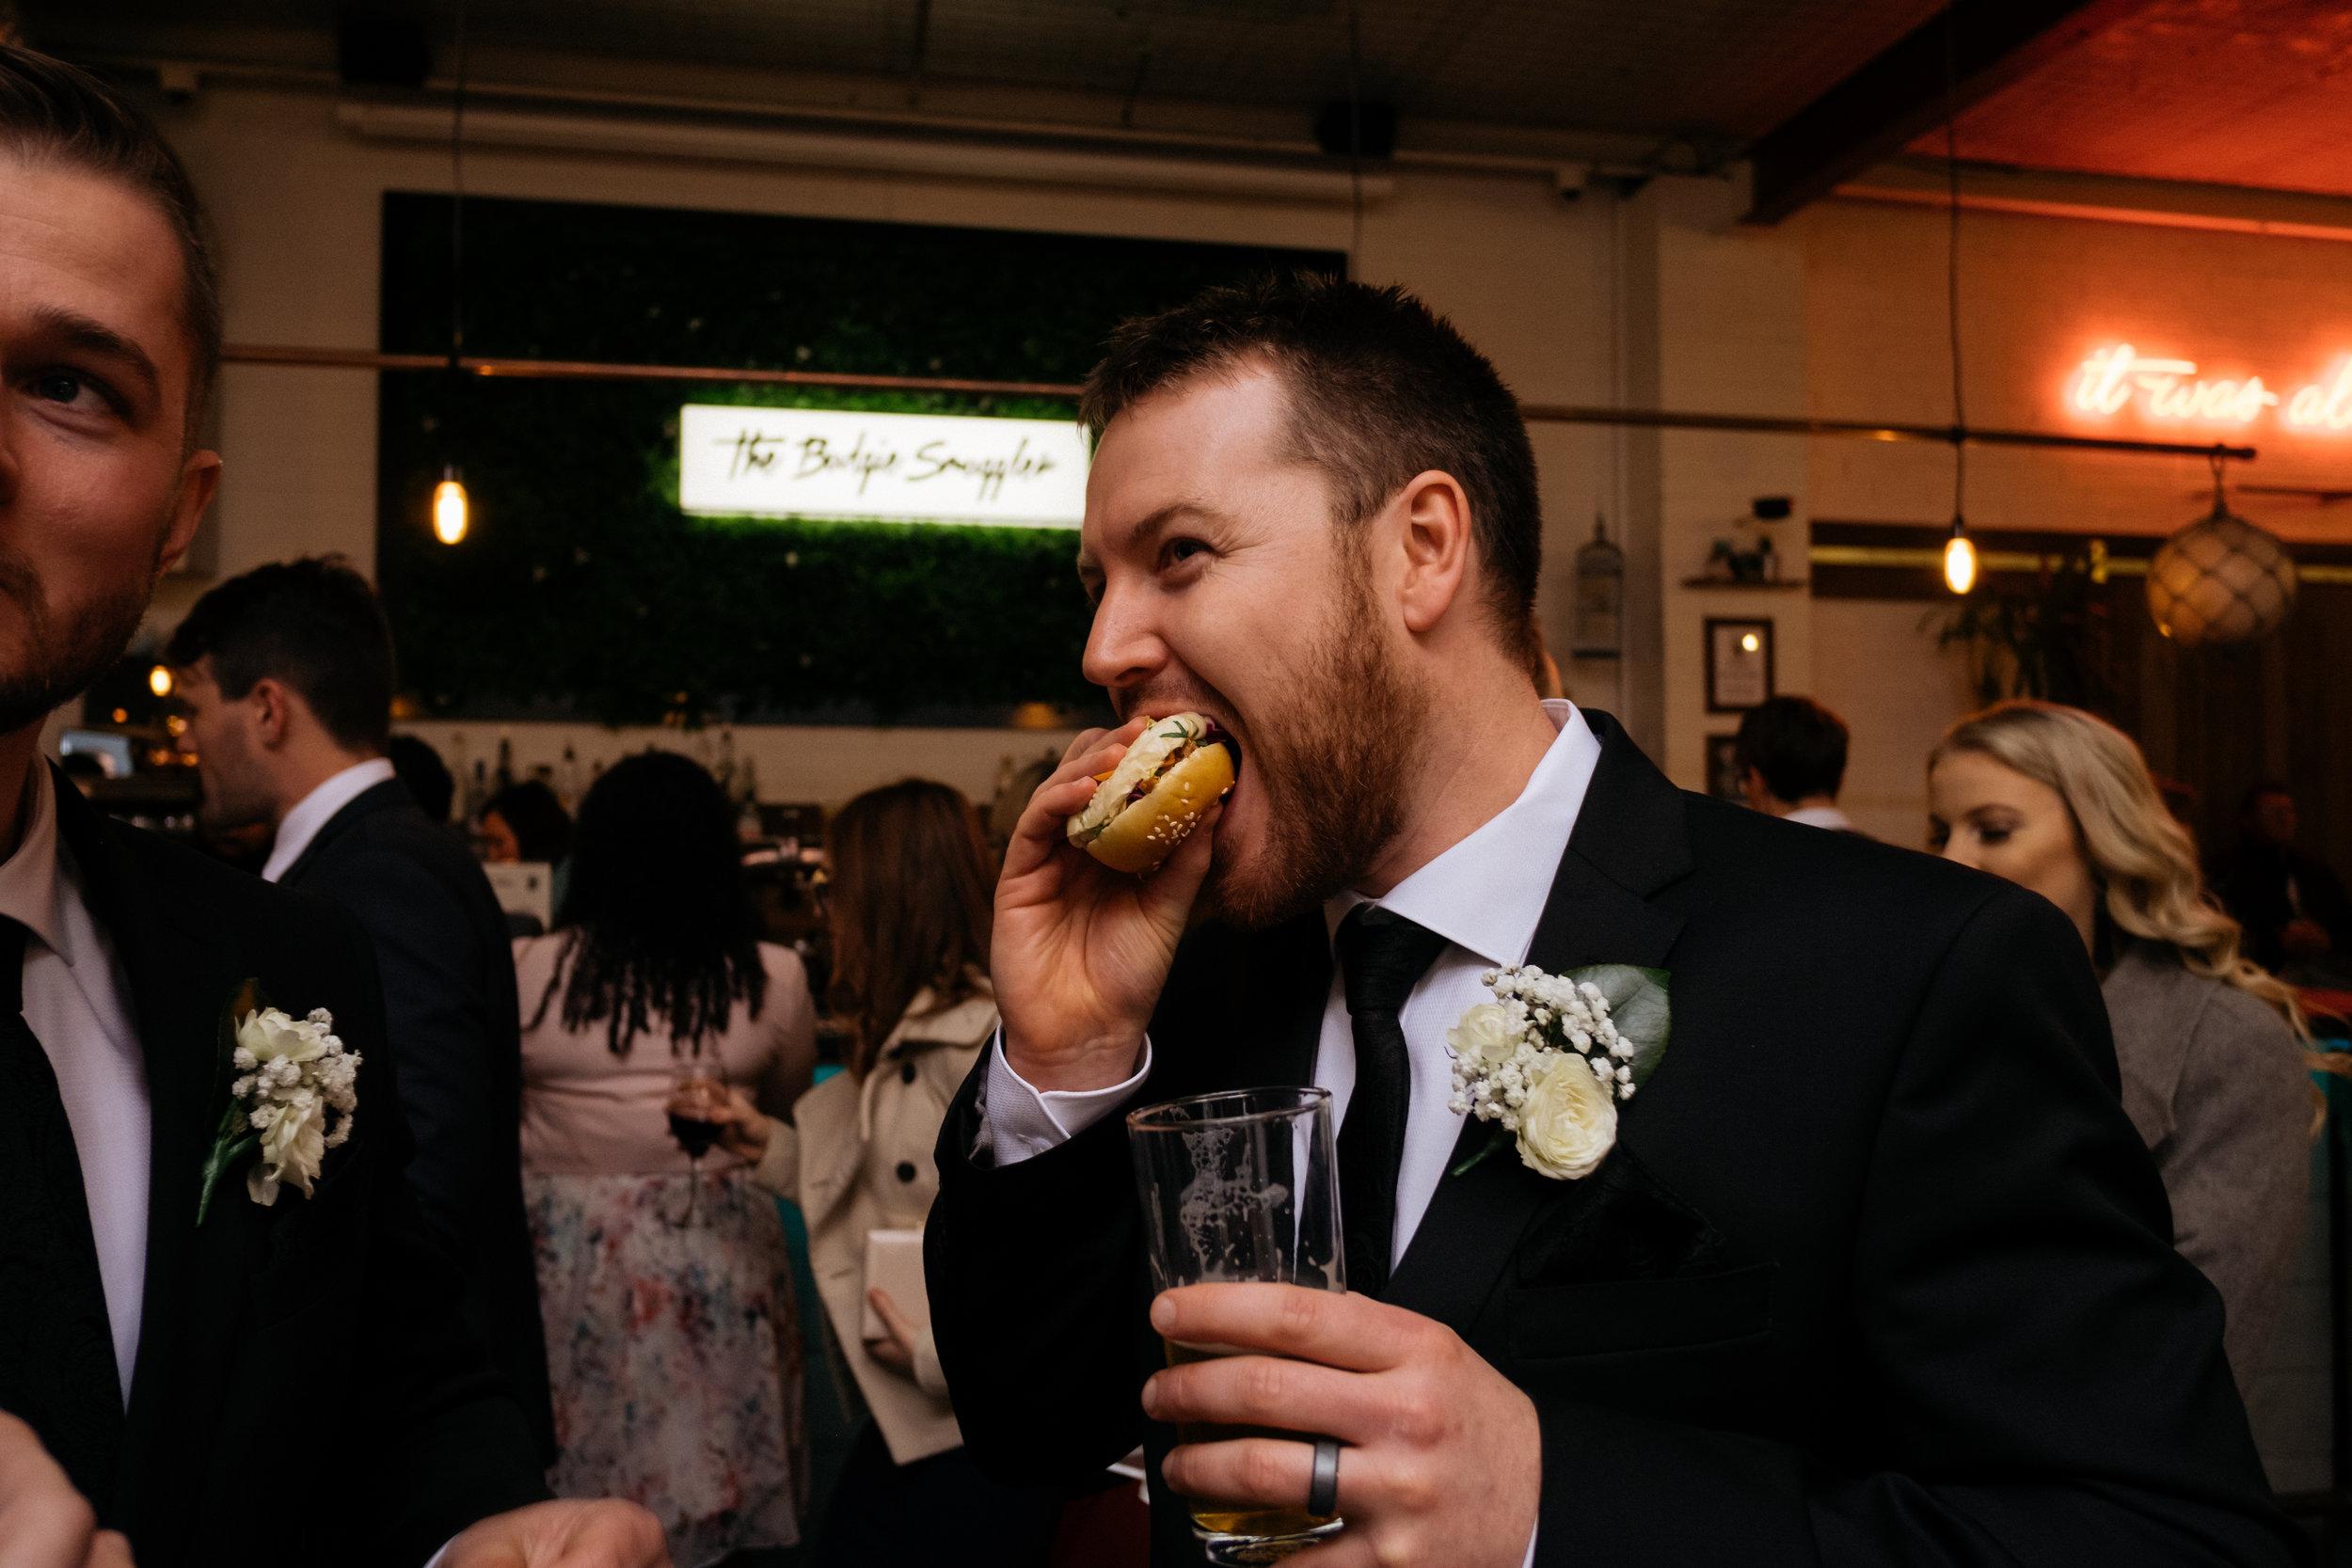 Groomsman eating a burger